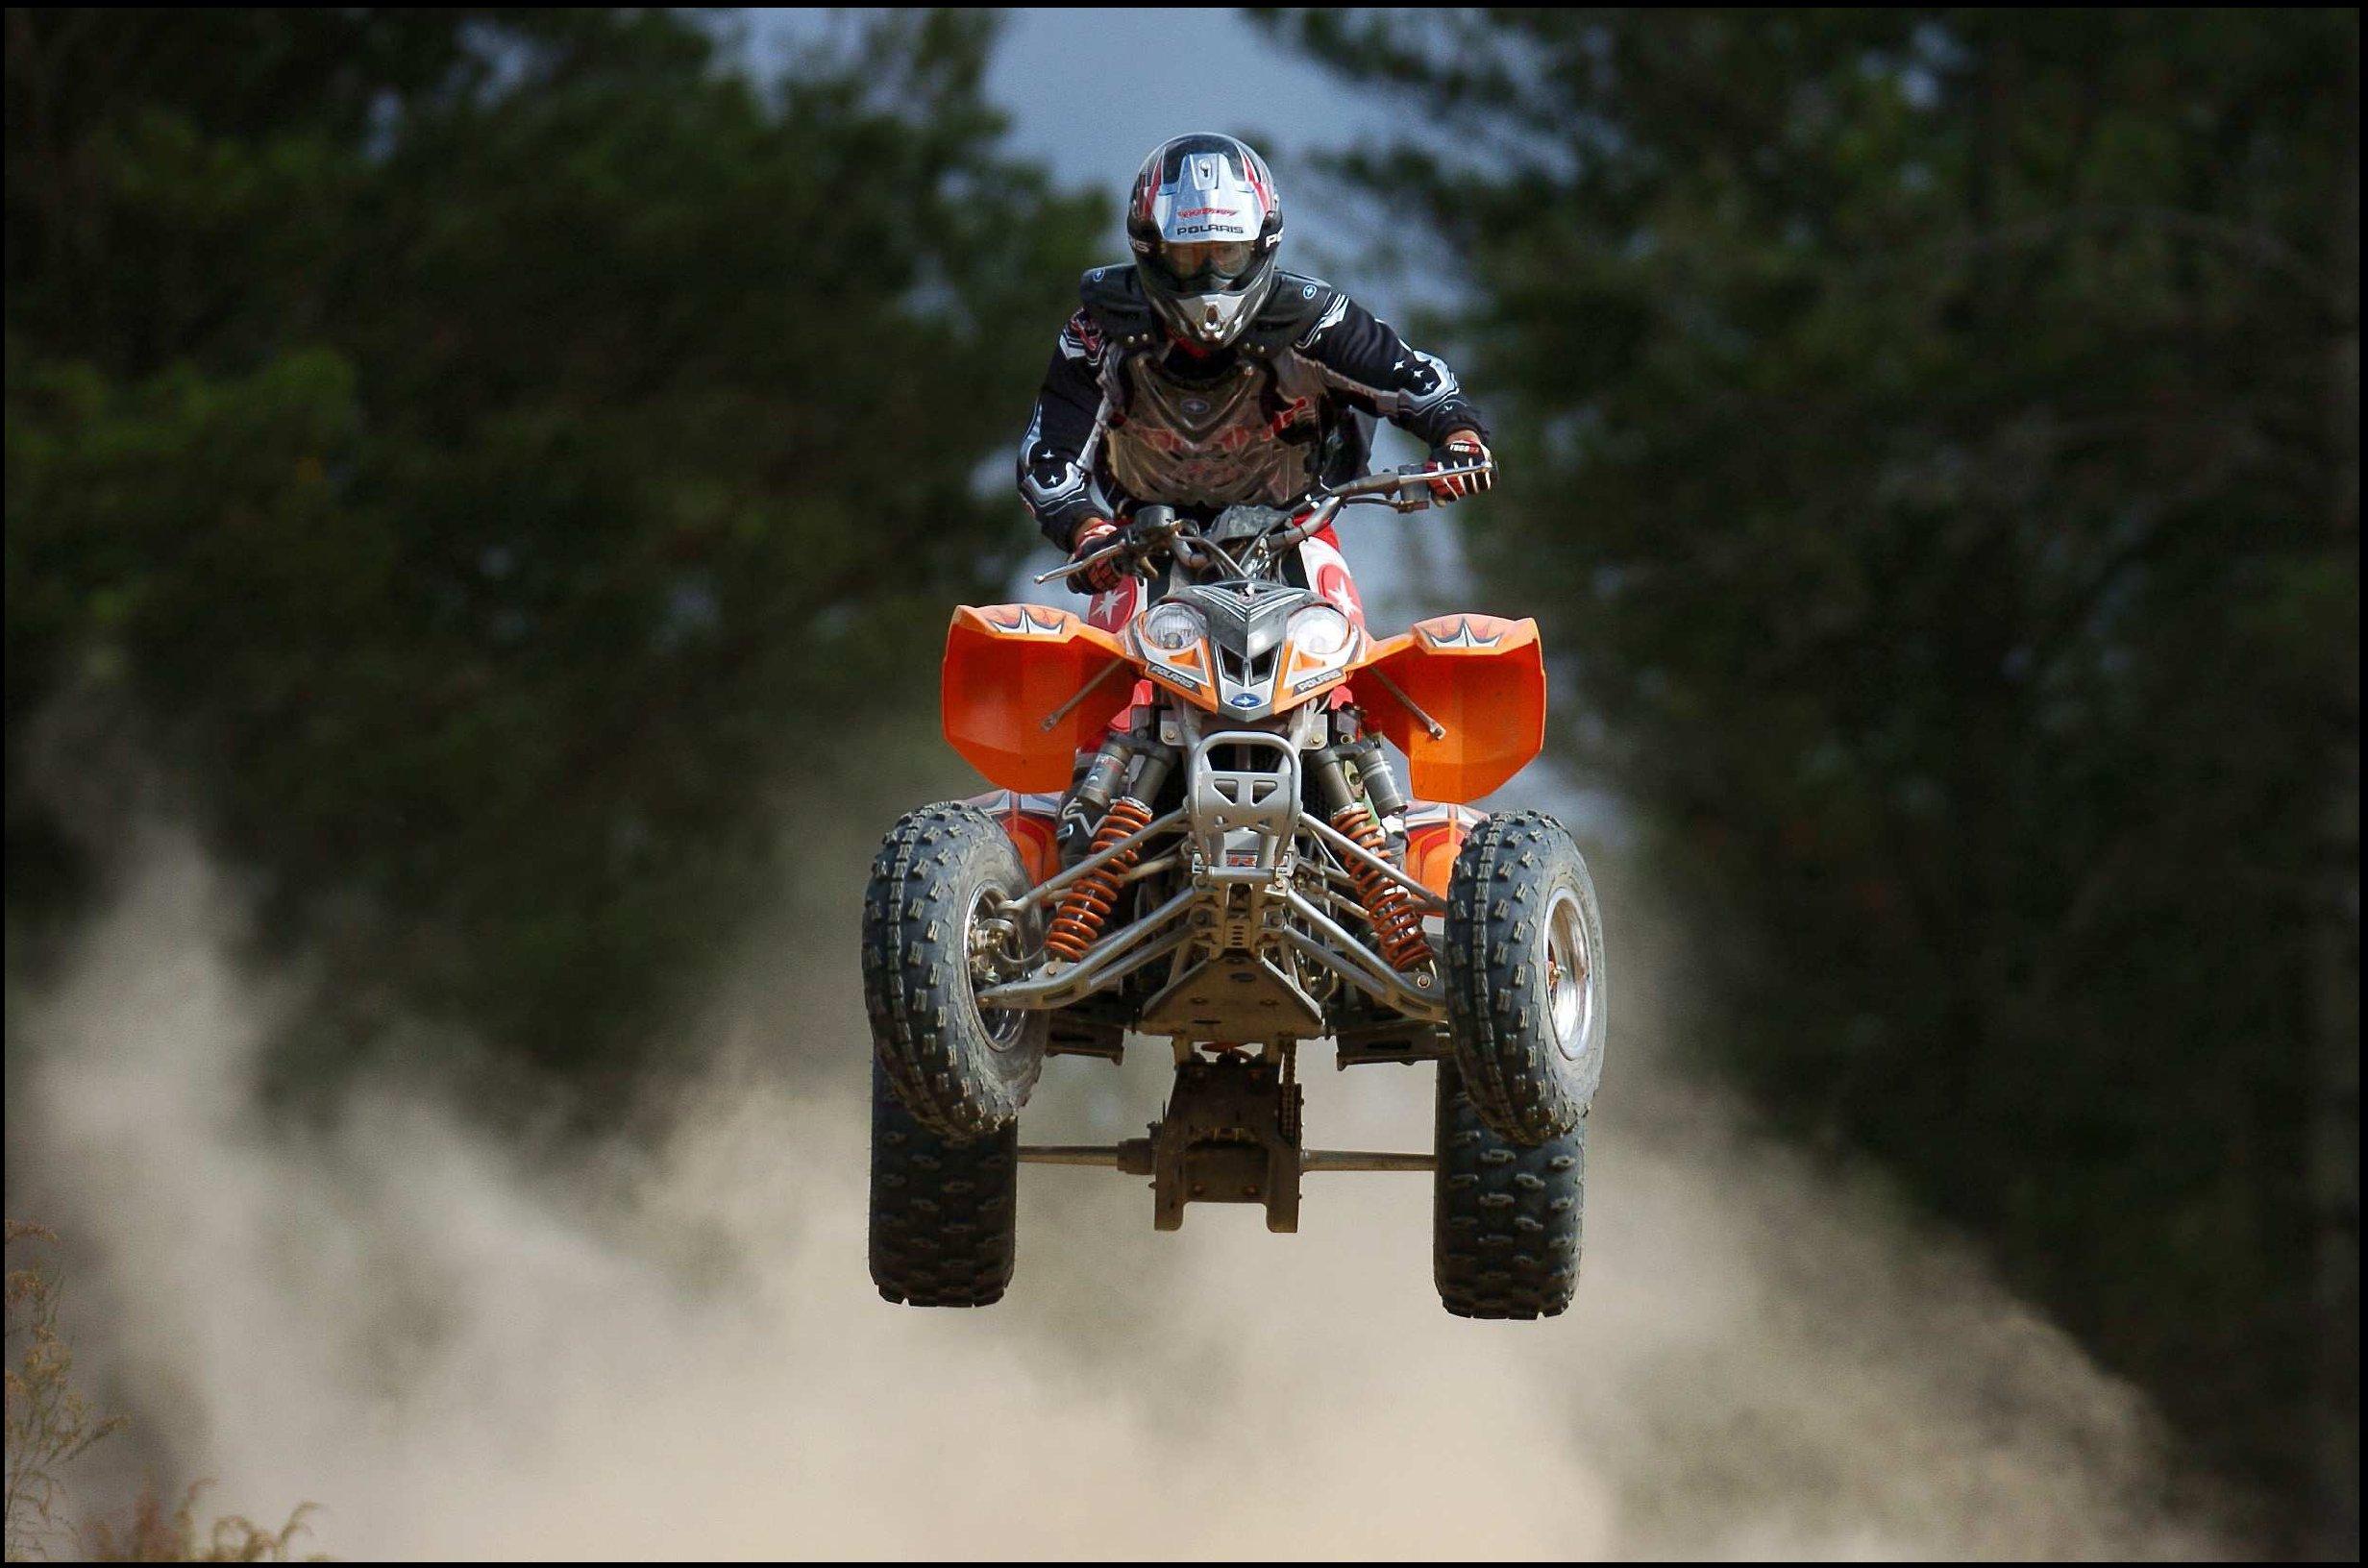 Polaris Predator Atv Quad Offroad Motorbike Bike Dirtbike Fz Wallpaper 2464x1632 190941 Wallpaperup